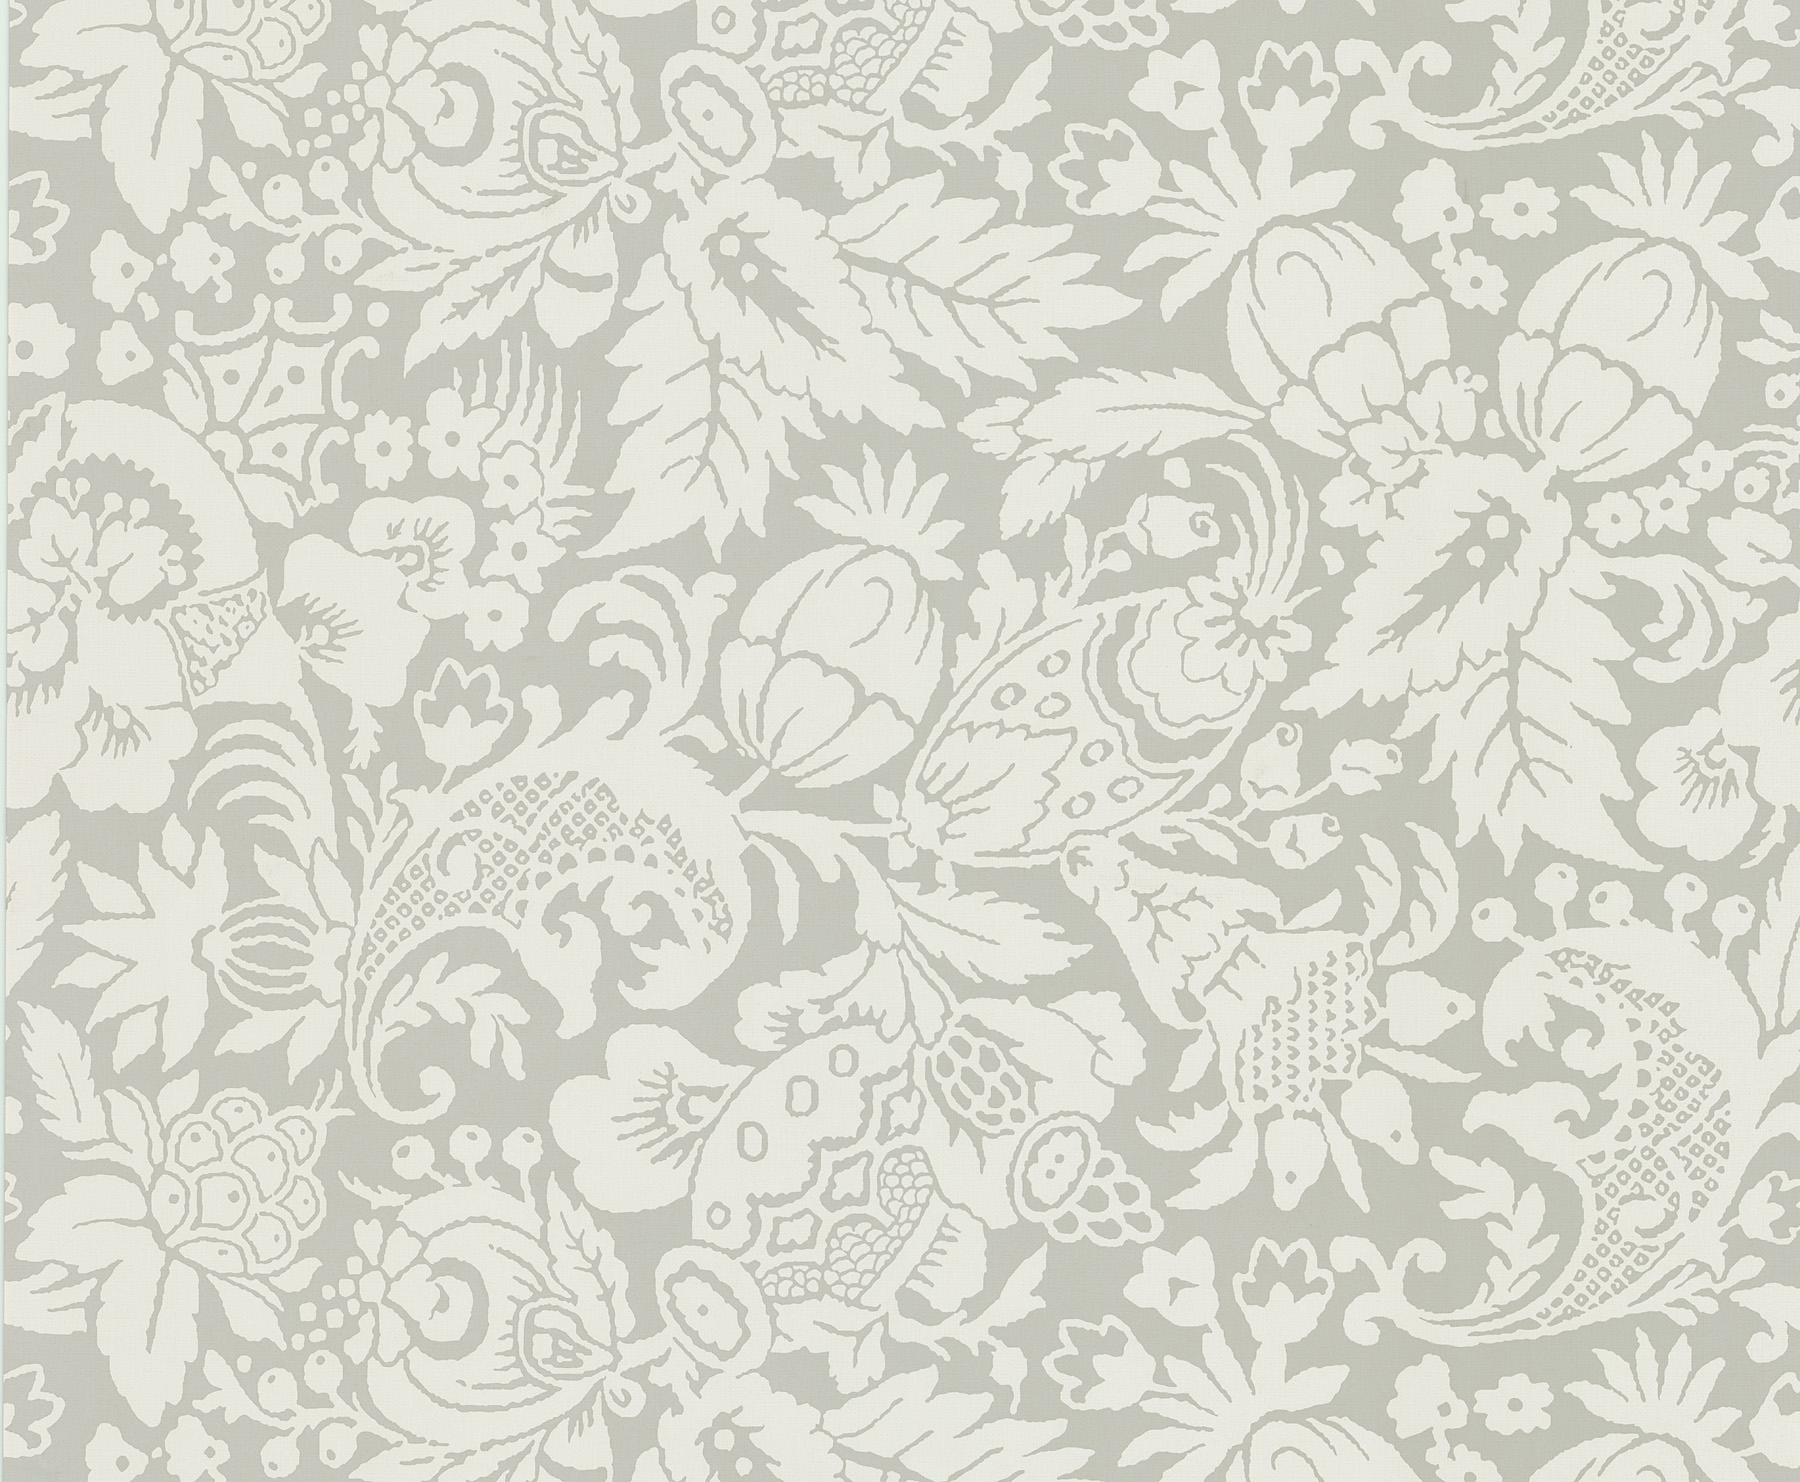 Picture of Bali Light Grey Scrolling Pattern Wallpaper